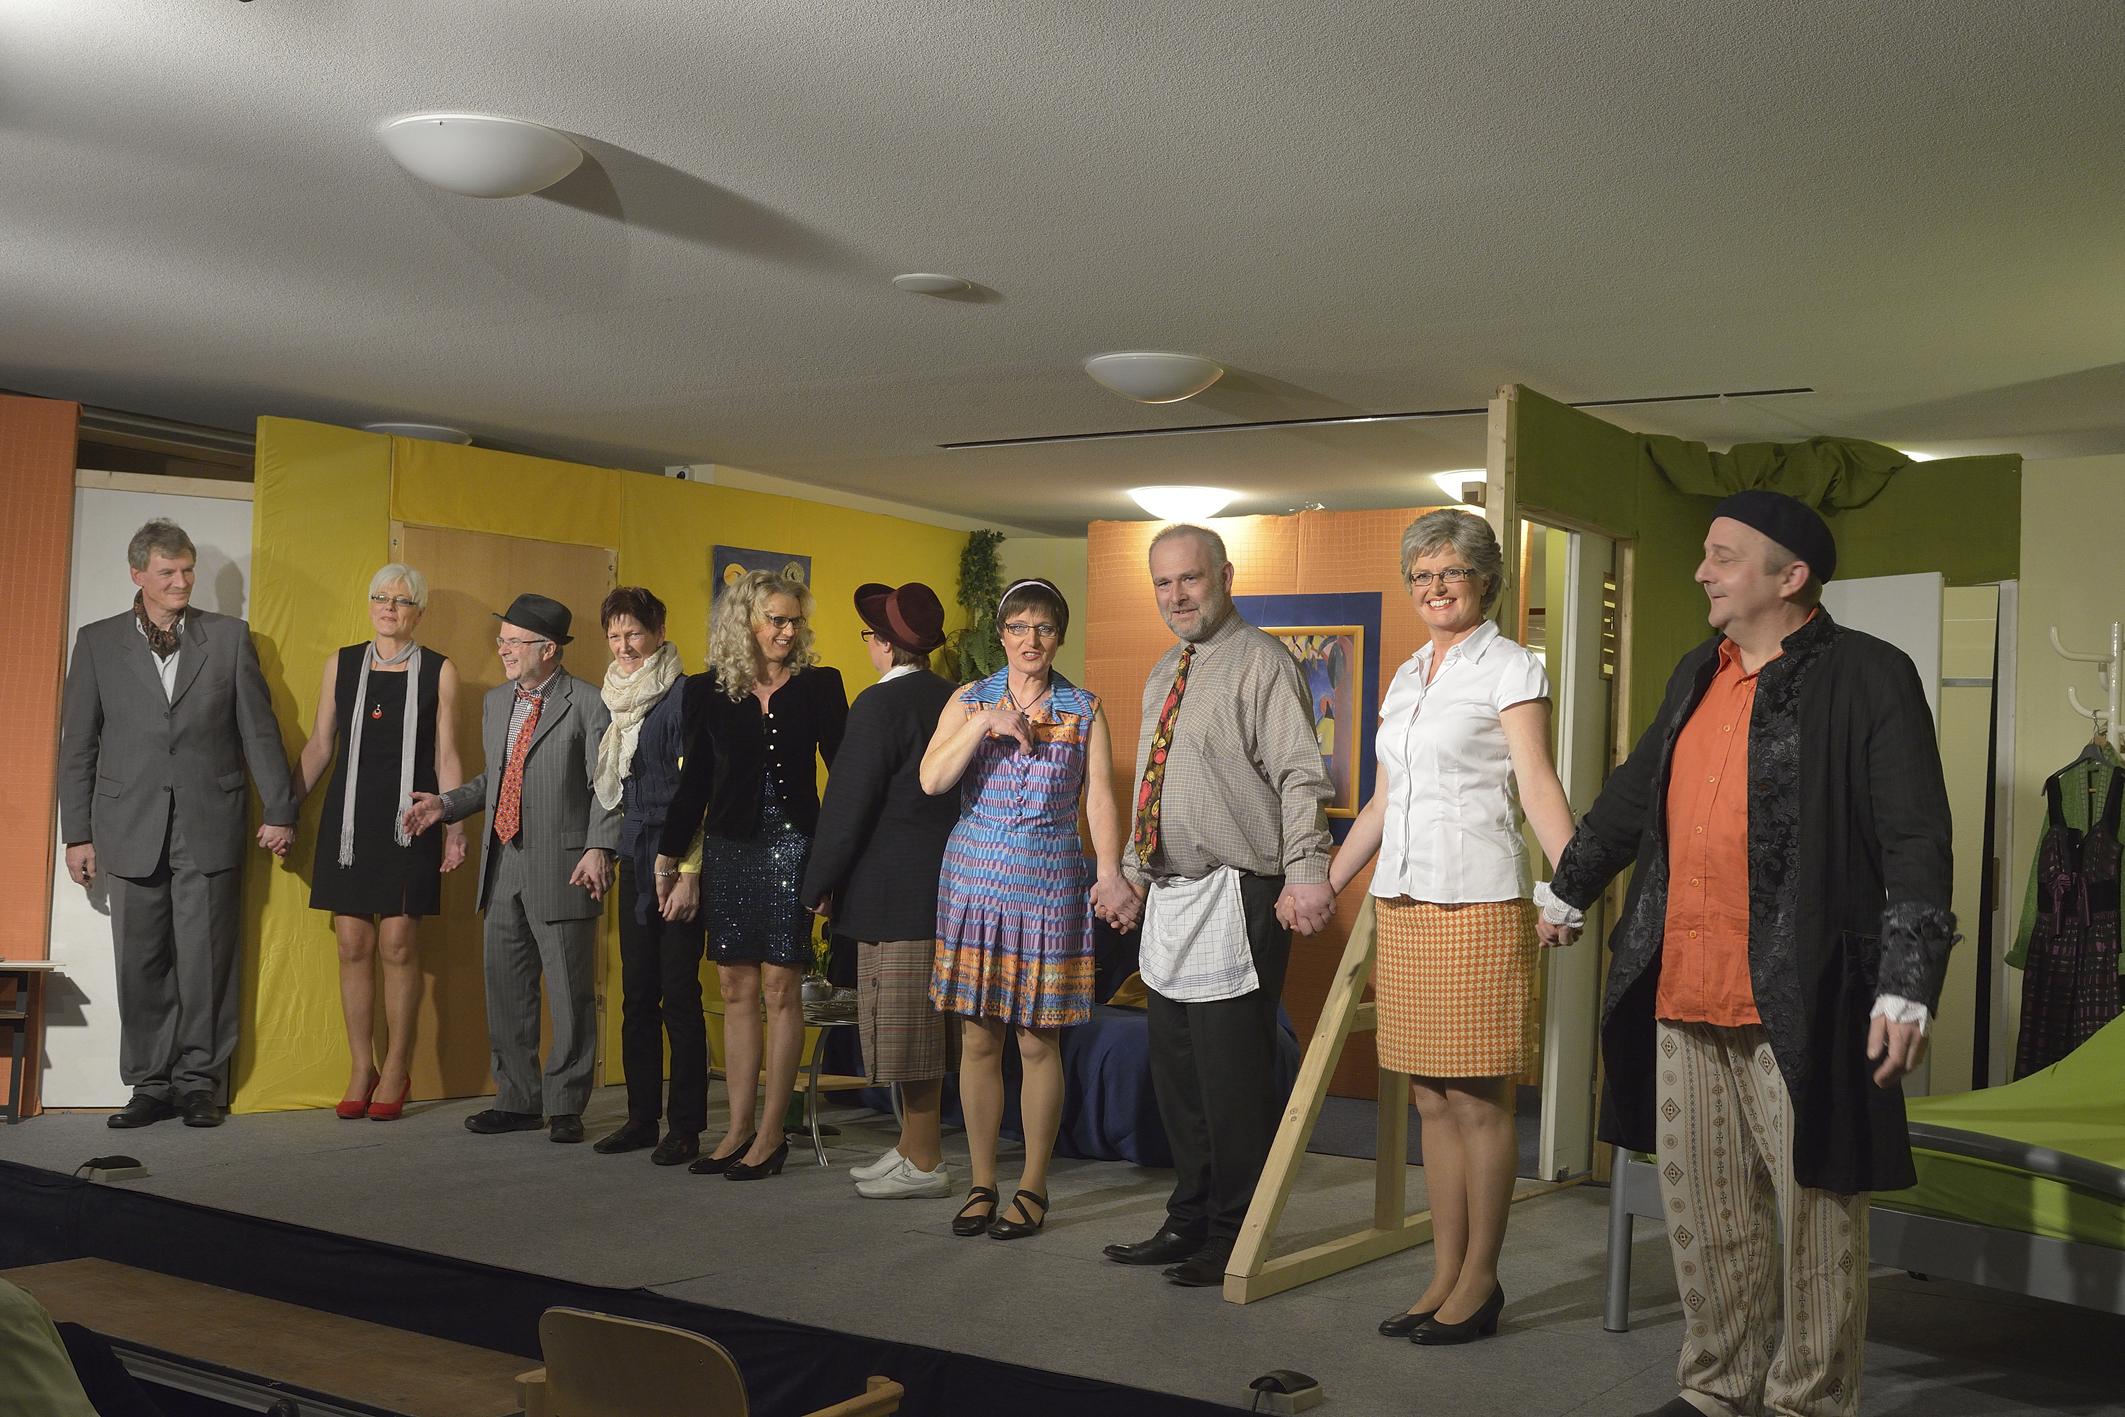 Aufführung Gruppe Mumm am 9.3.2014 im Forum der Grundschule Kutenhausen Heimatverein Kutenhausen